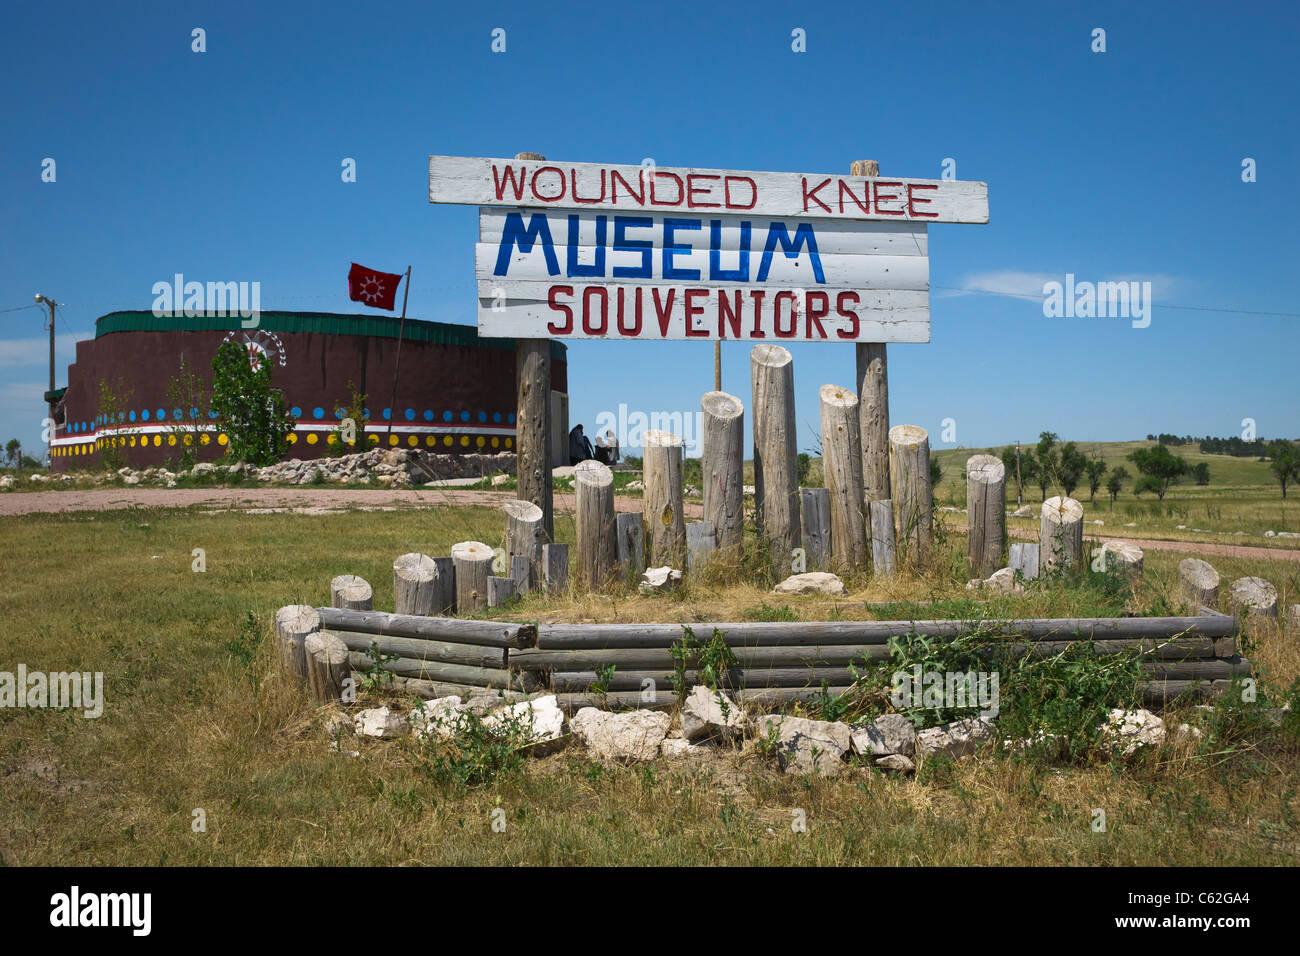 Wounded Knee massacre Museum located near mass grave on Oglala Lakota Sioux Pine Ridge reservation in South Dakota Stock Photo